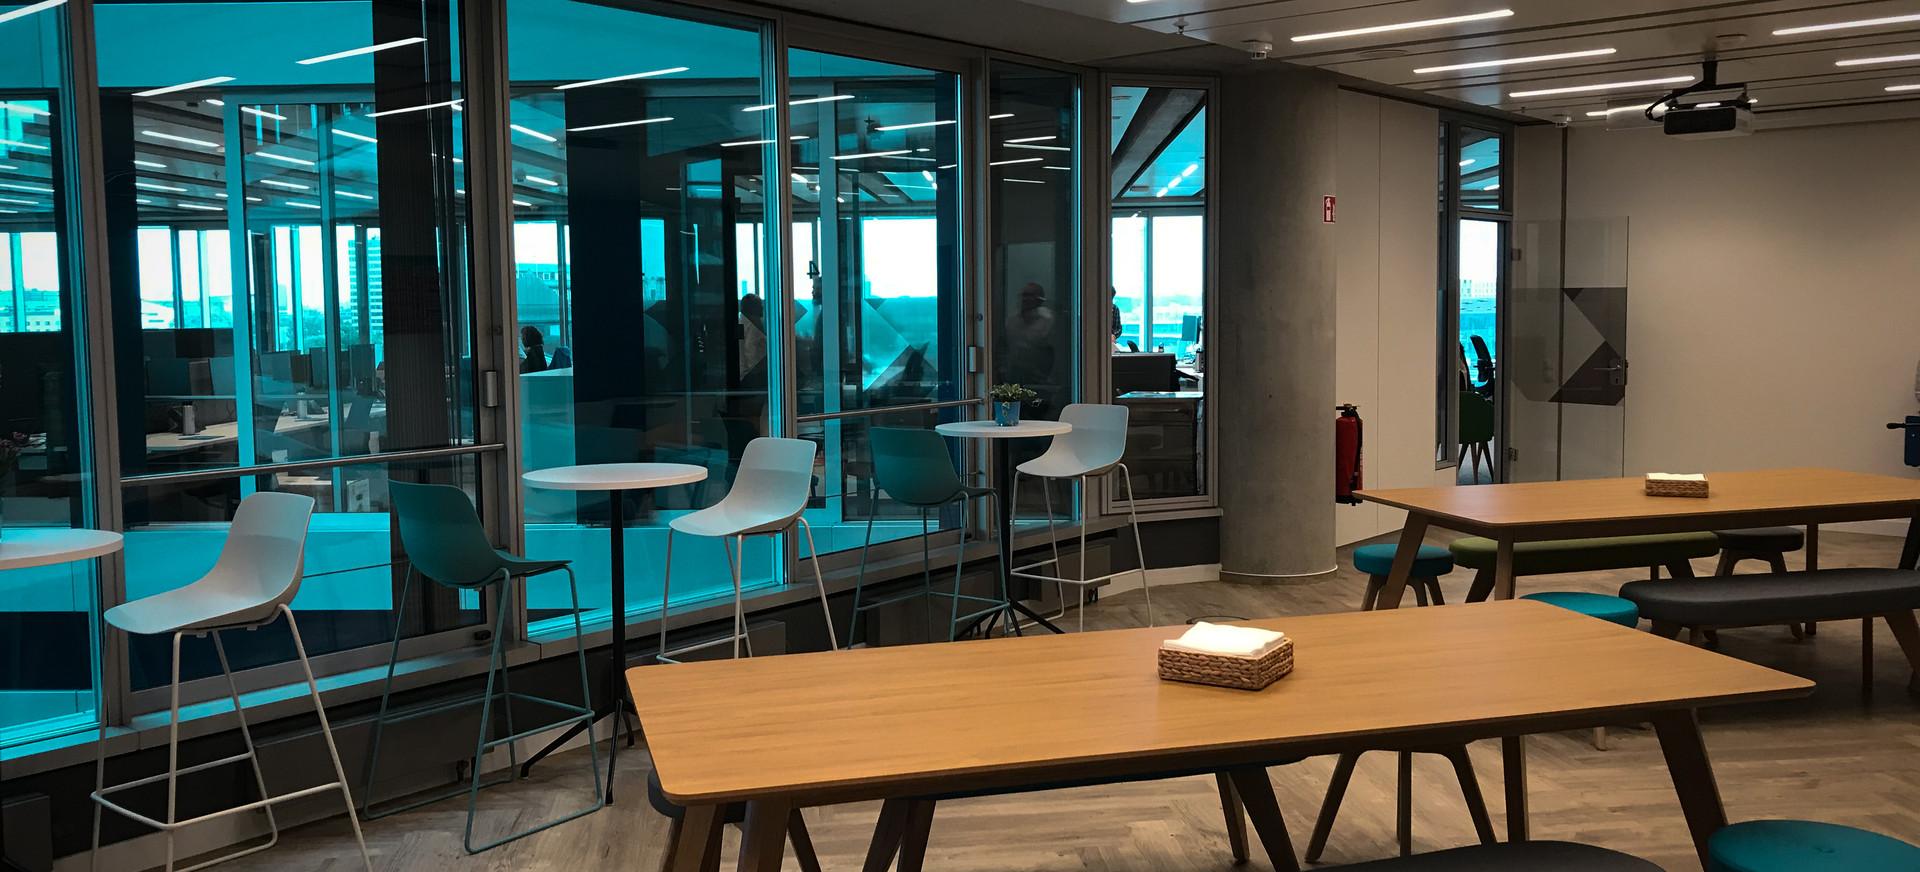 Hamburg 2020 Commercial Interior design shoot for an international client